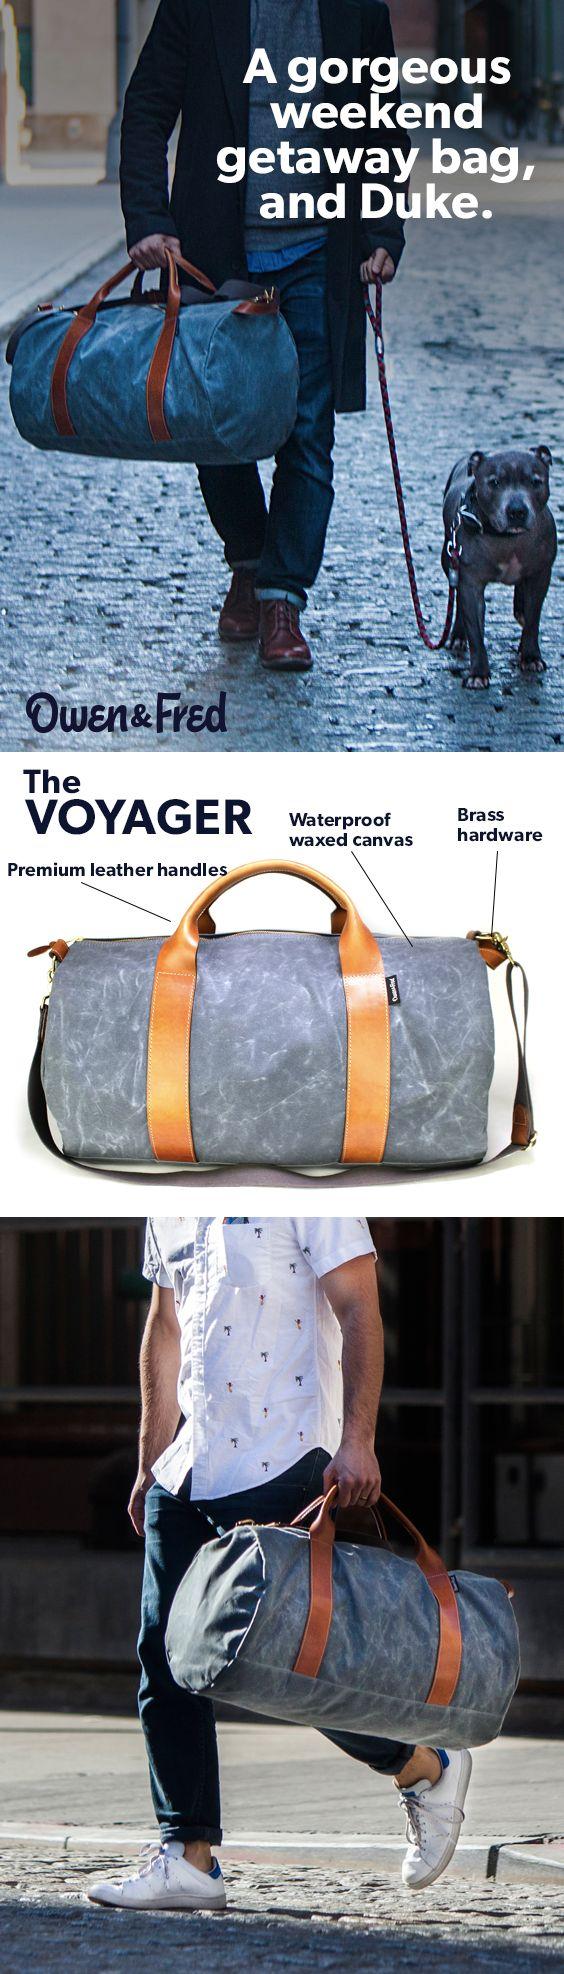 248 best ❦ bags / carryalls ❦ images on Pinterest | Backpacks ...